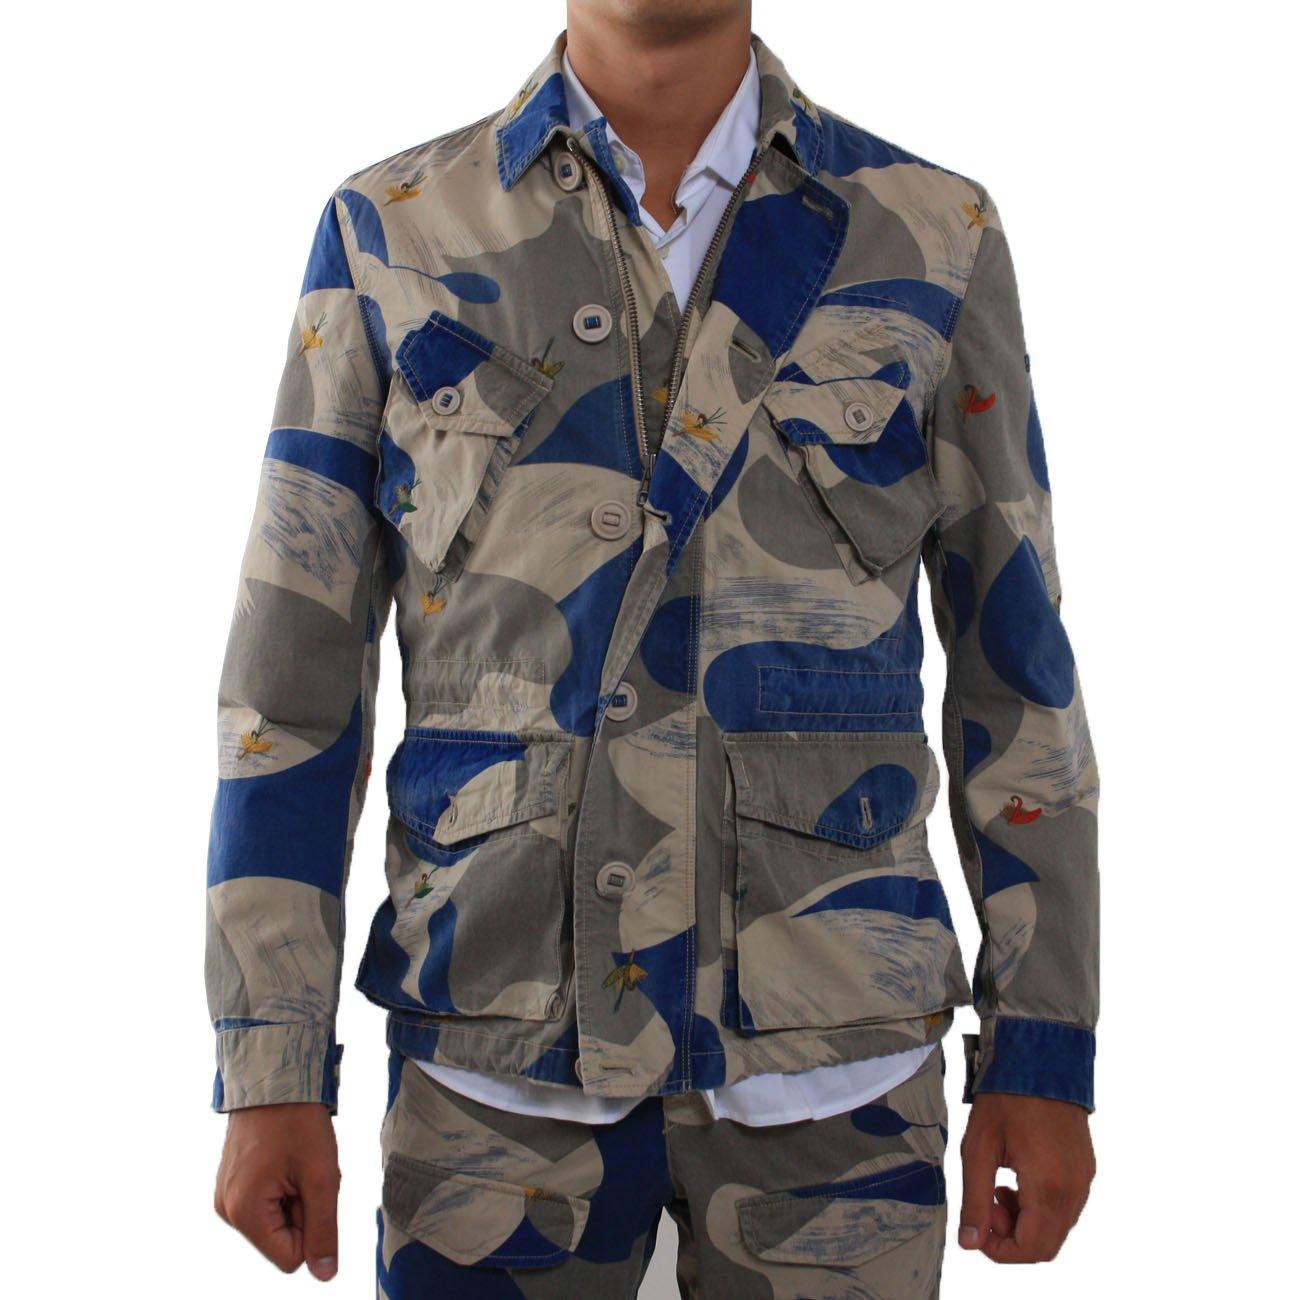 Jacke Herren Herren Jacke MBekleidung Ganesh Ganesh Sabbiablu kZXuiP